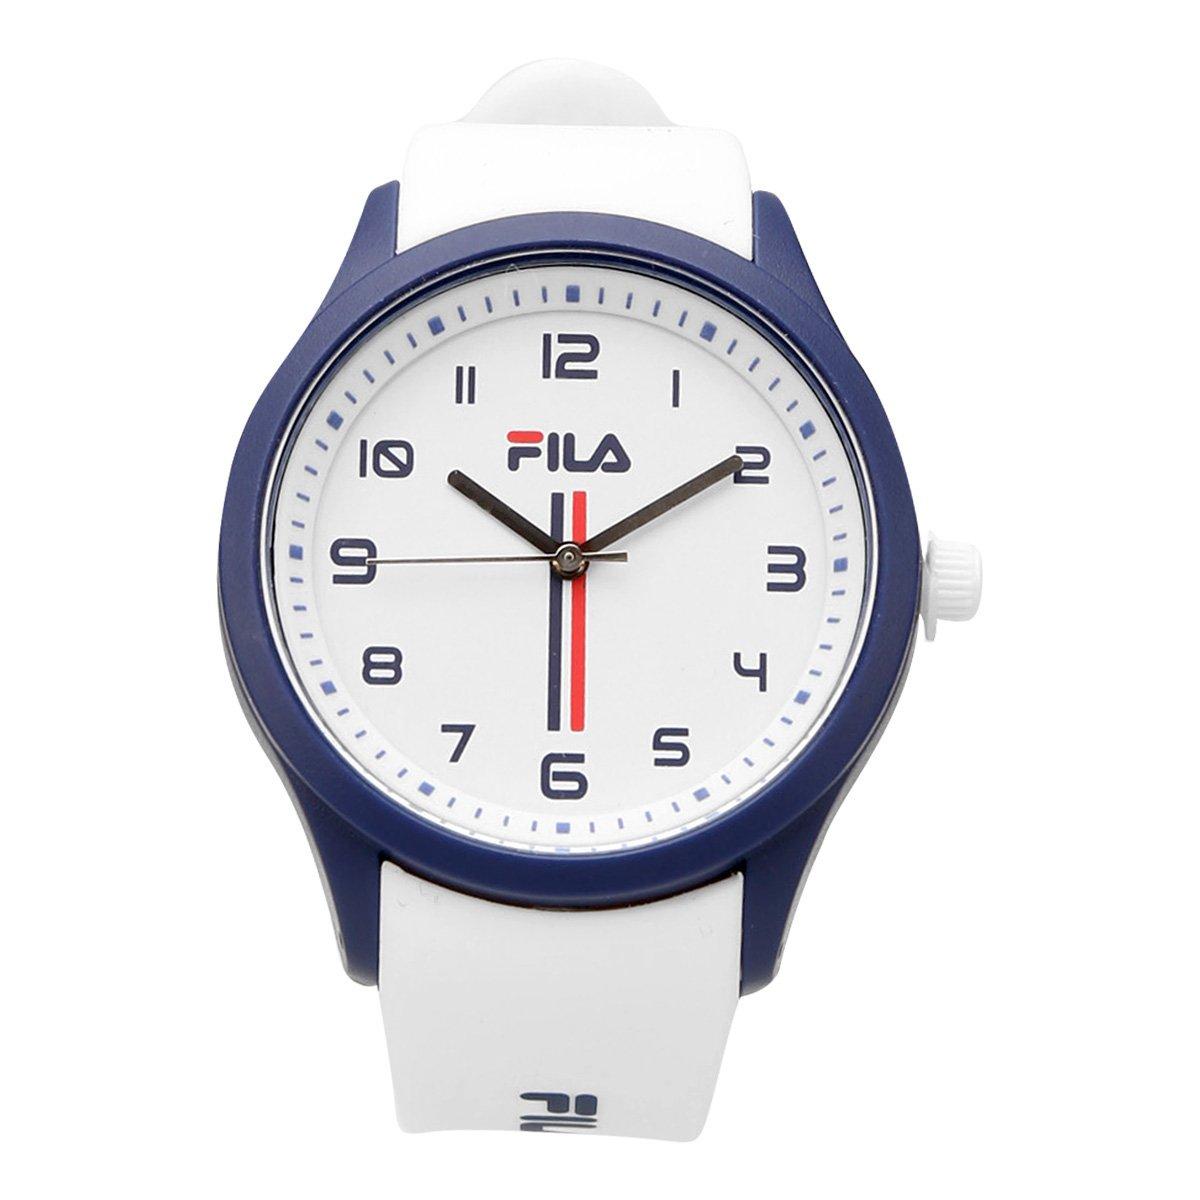 79950095522 Relógio Fila Analógico c  Guarda-Chuva Exclusivo 38-092-002 - Compre Agora